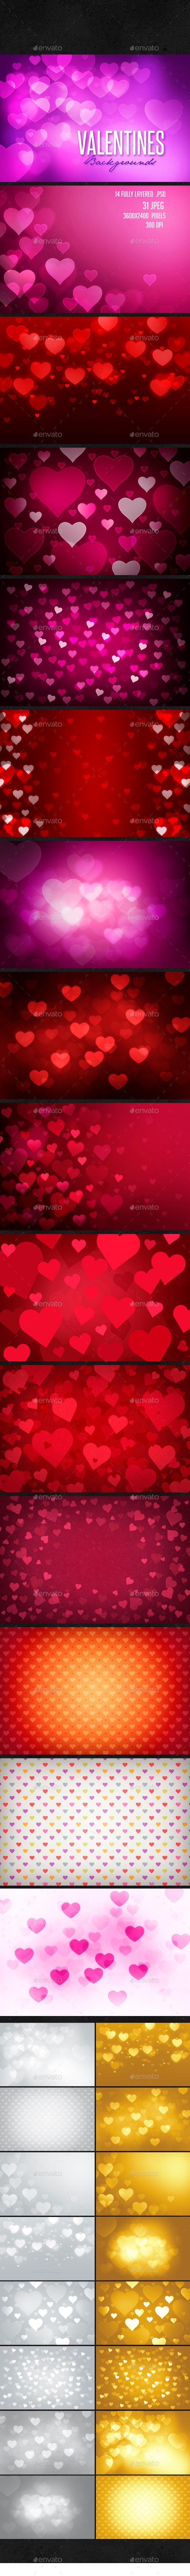 GraphicRiver Valentine s Day Background 9937051